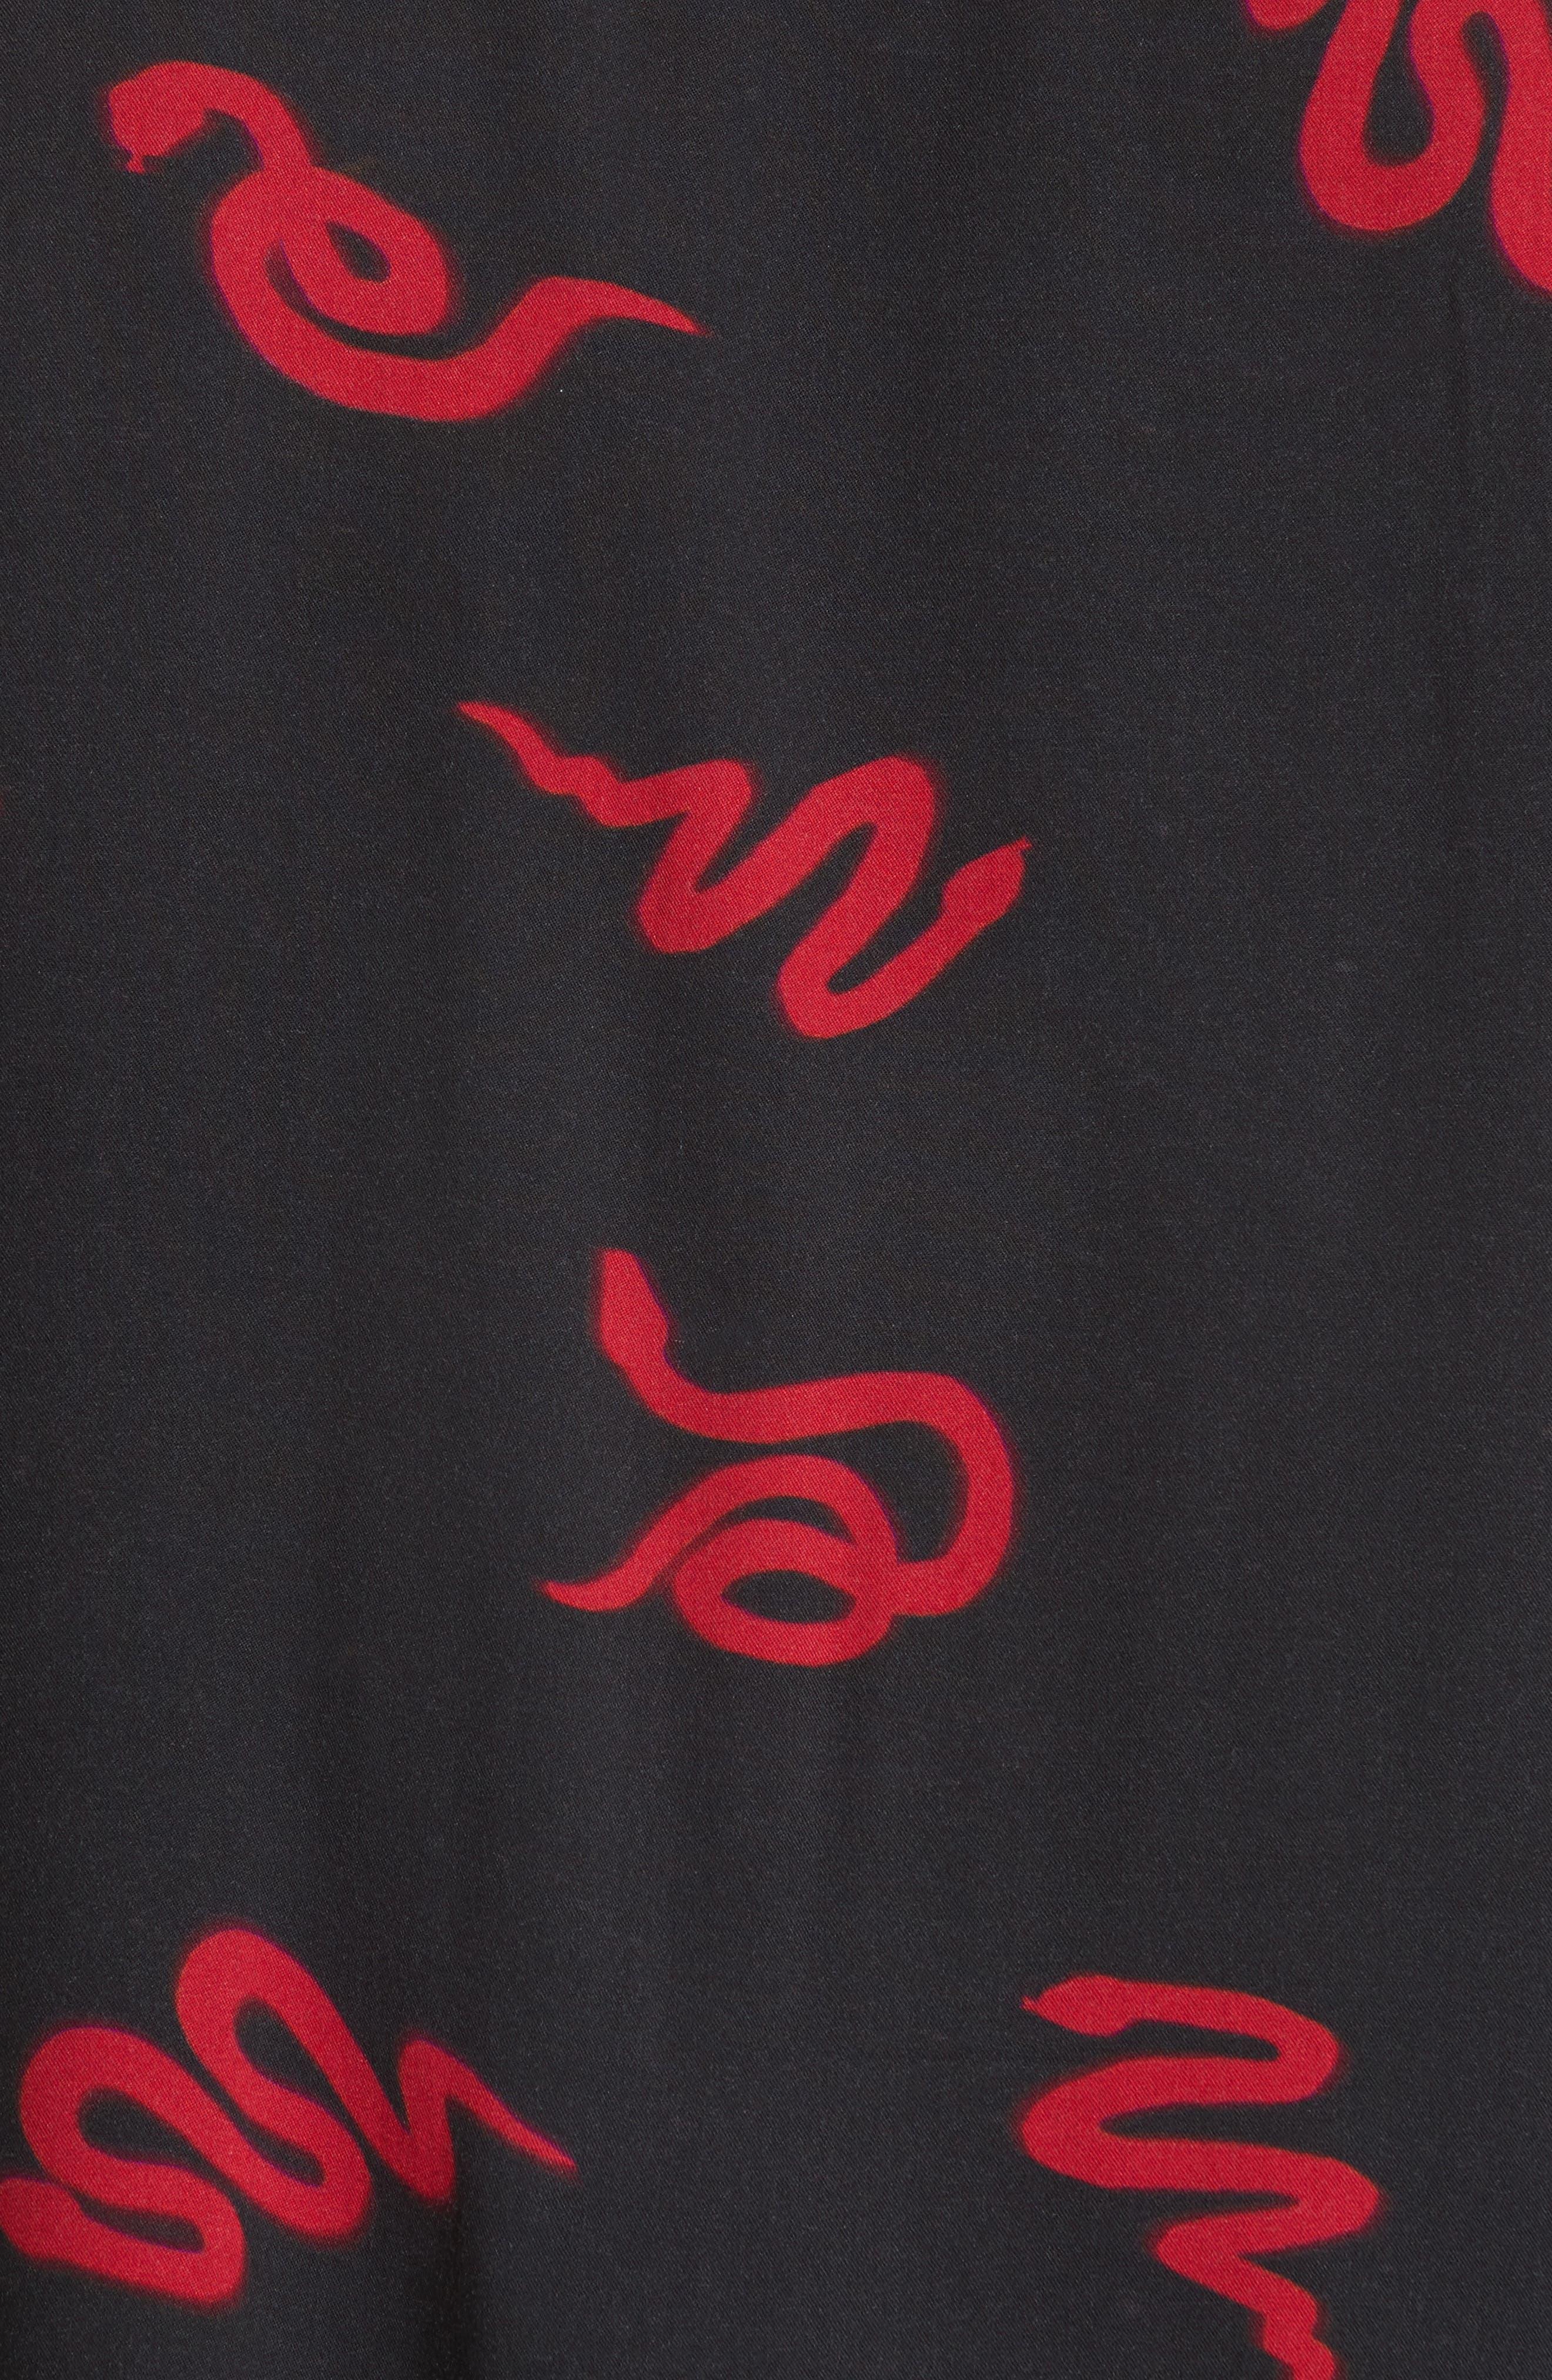 Neon Snake Print Rayon Shirt,                             Alternate thumbnail 5, color,                             Black/ Red